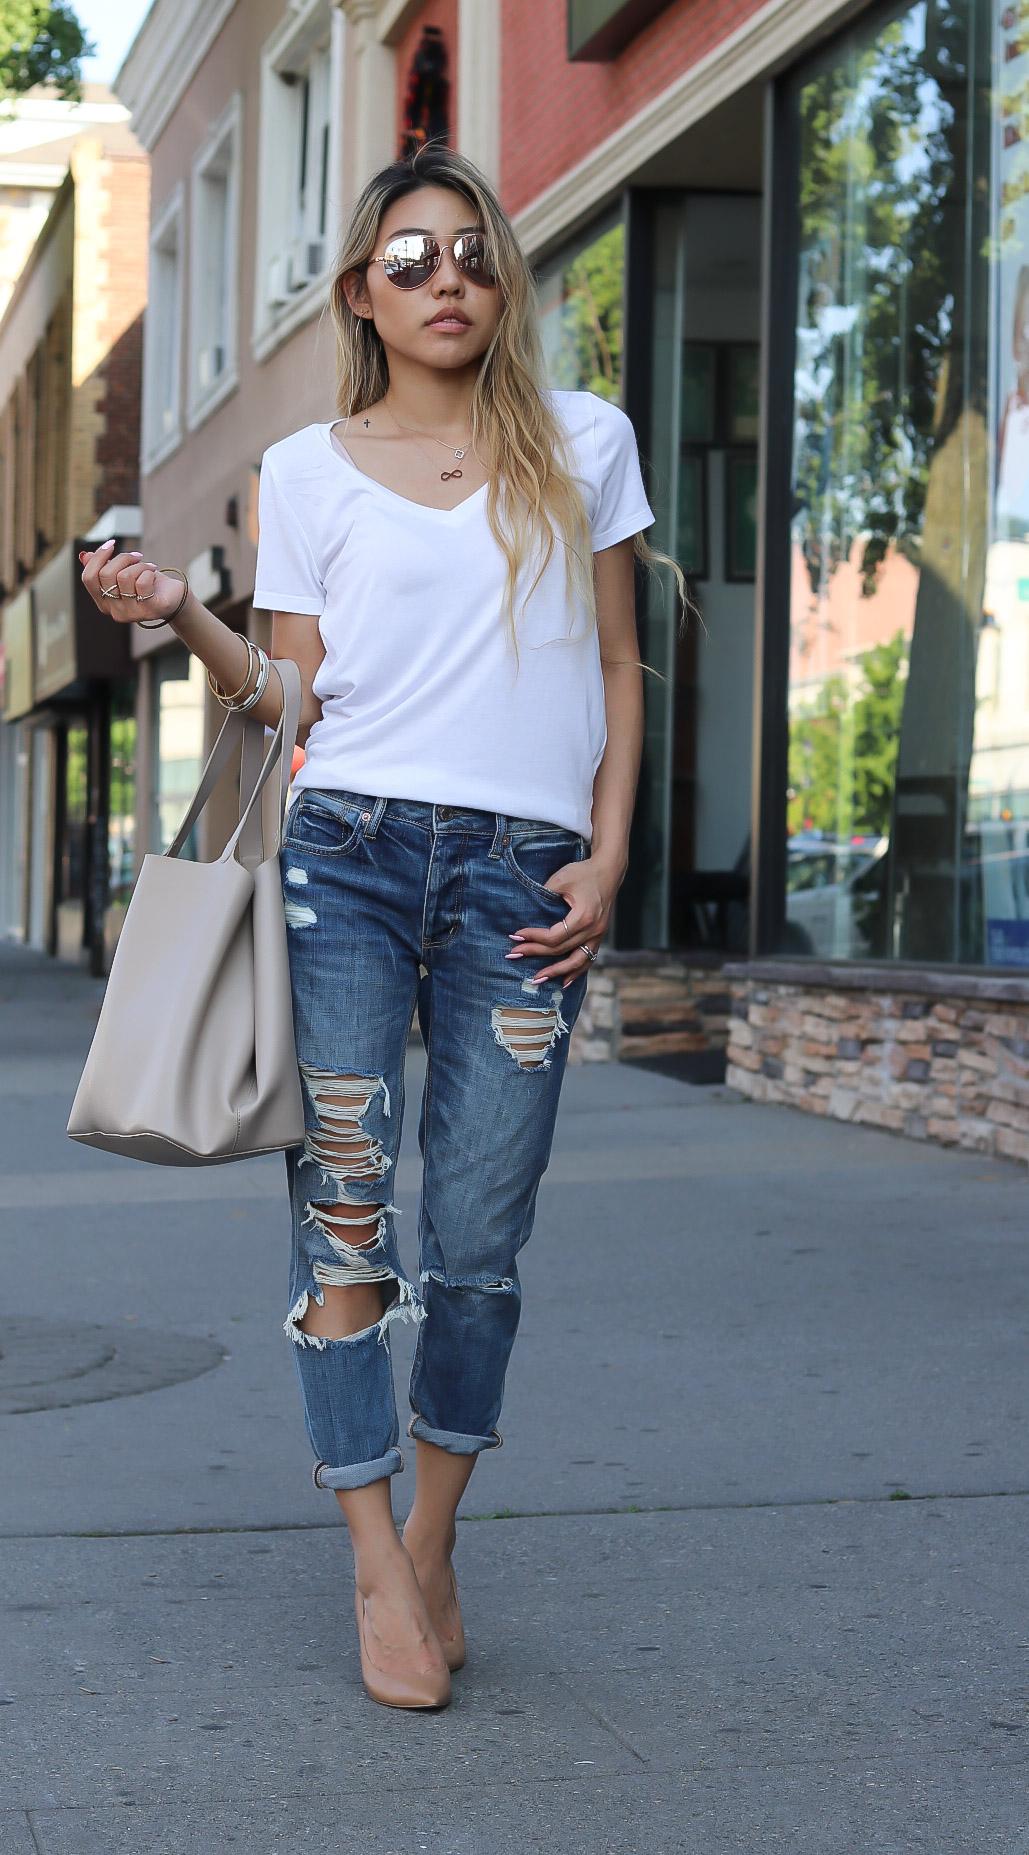 White Tee And Boyfriend Jeans